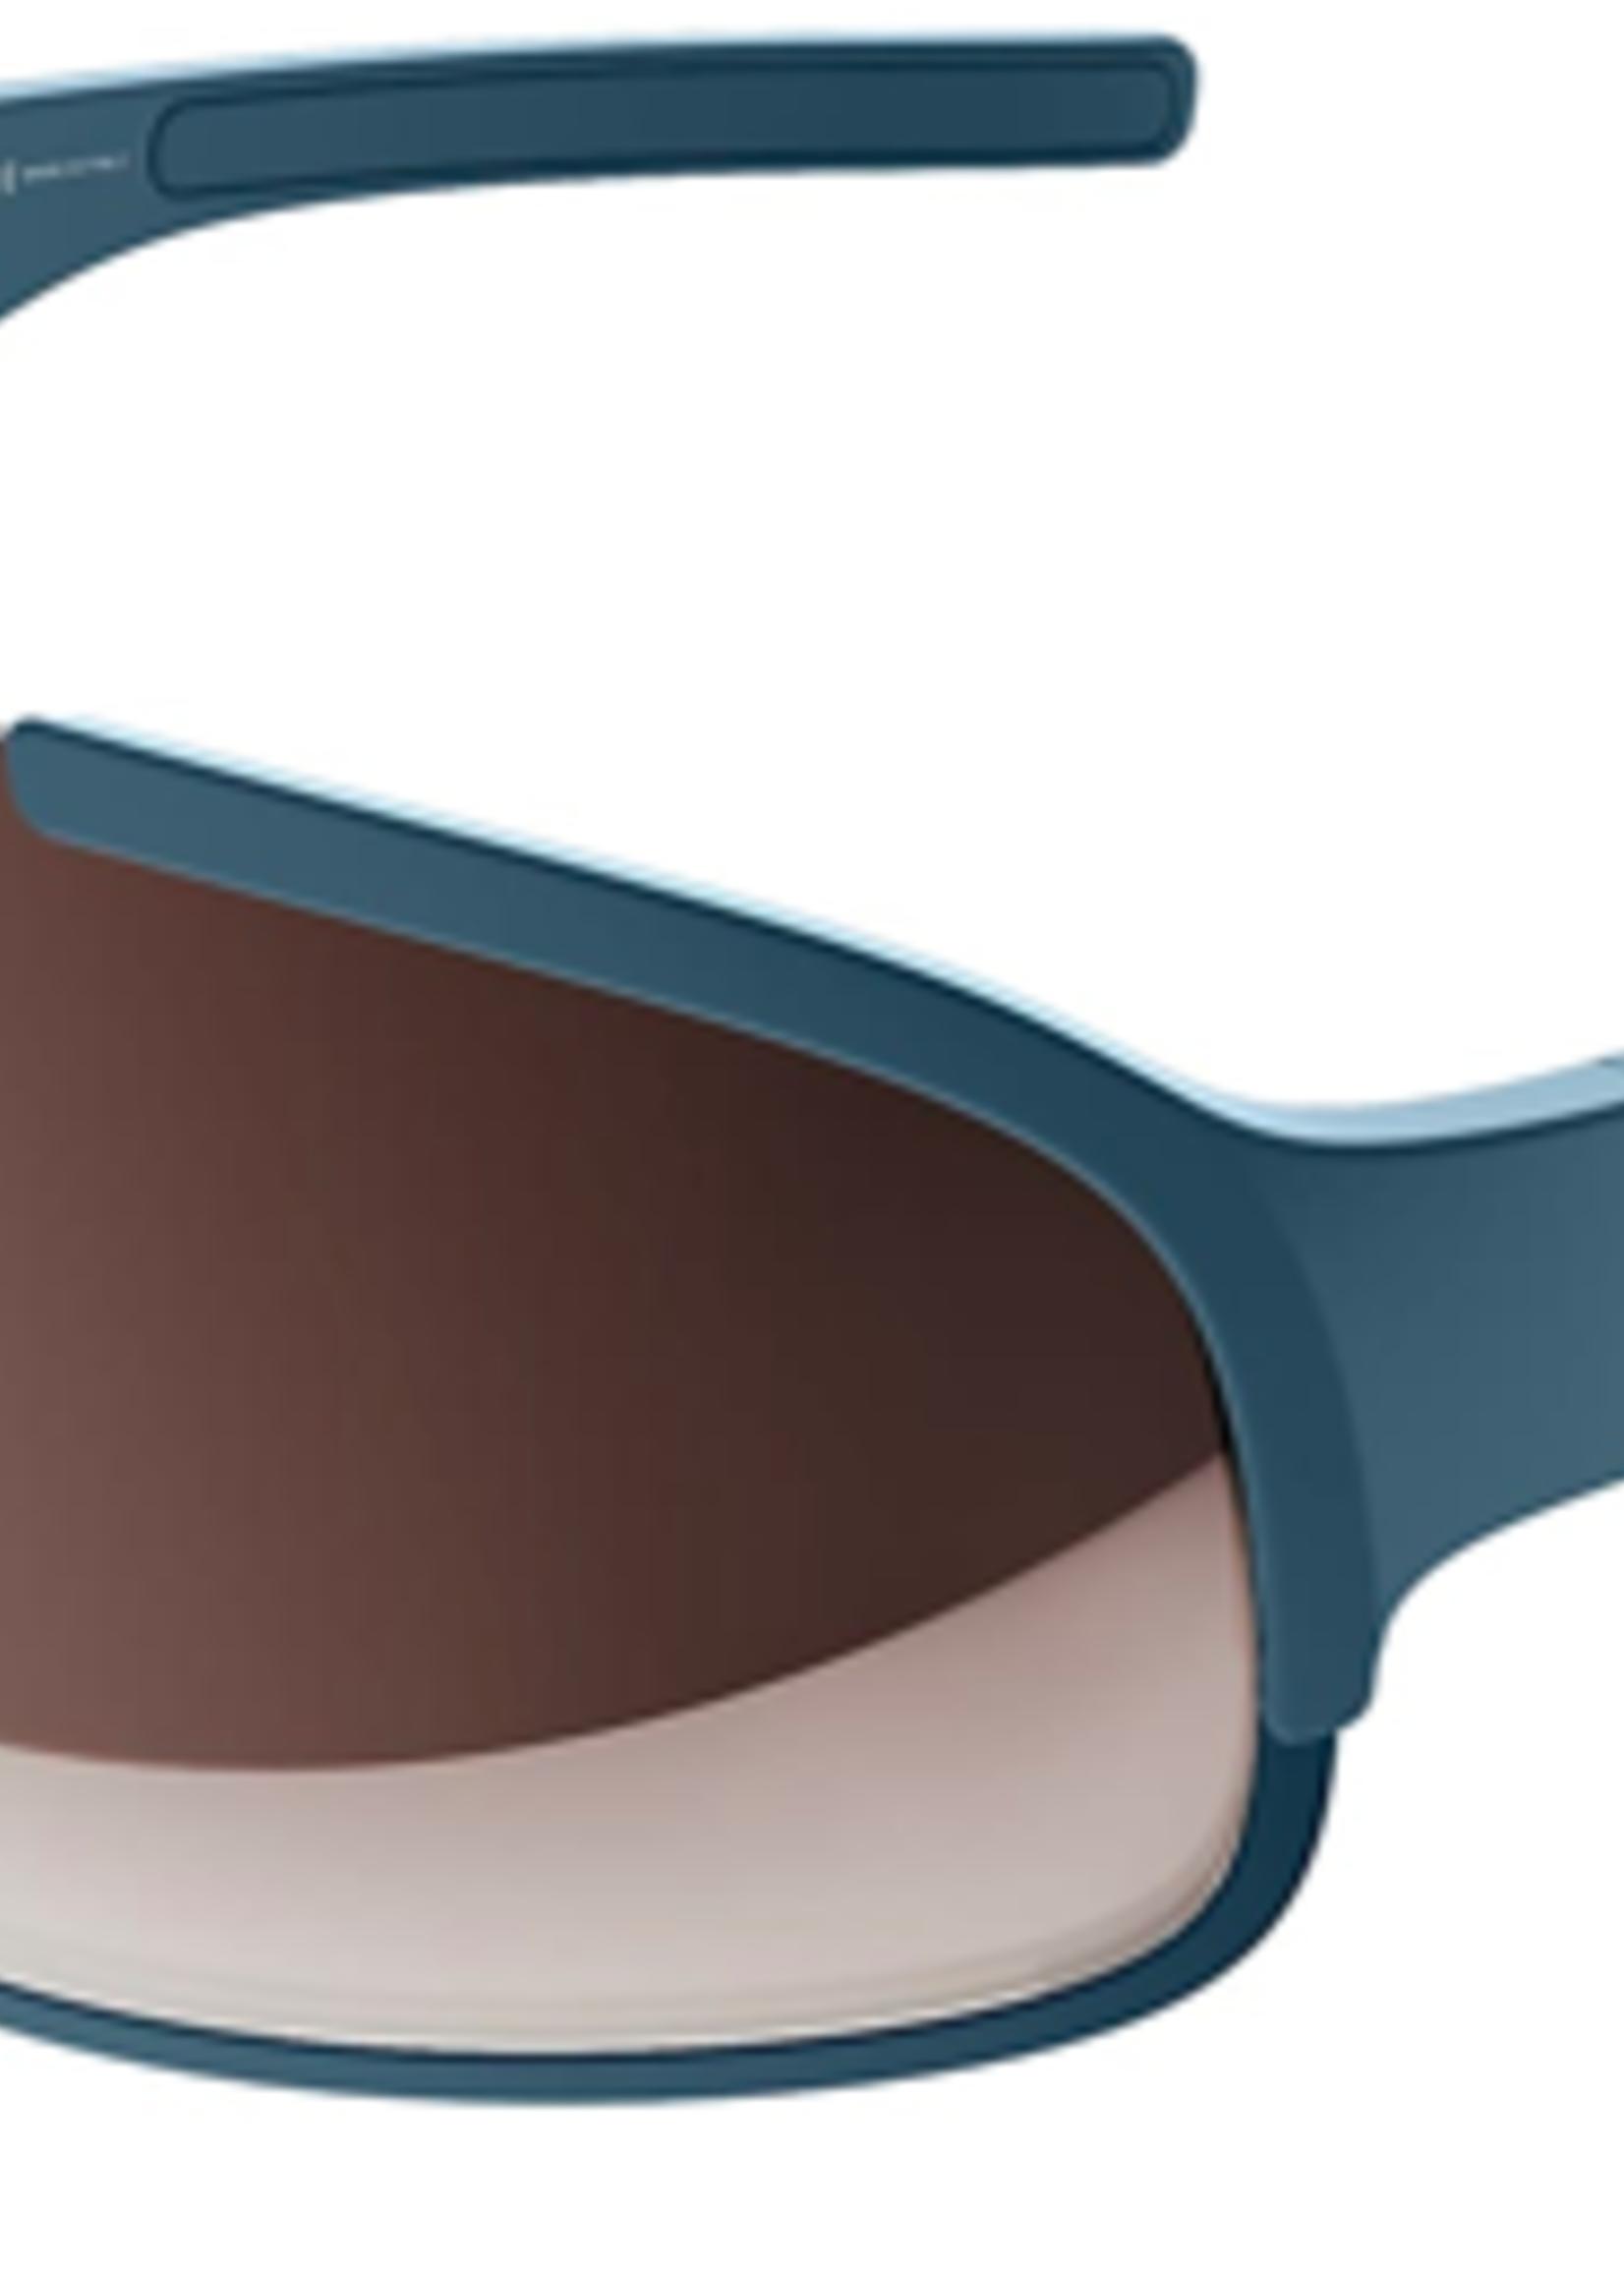 POC POC Crave Biking Sunglasses